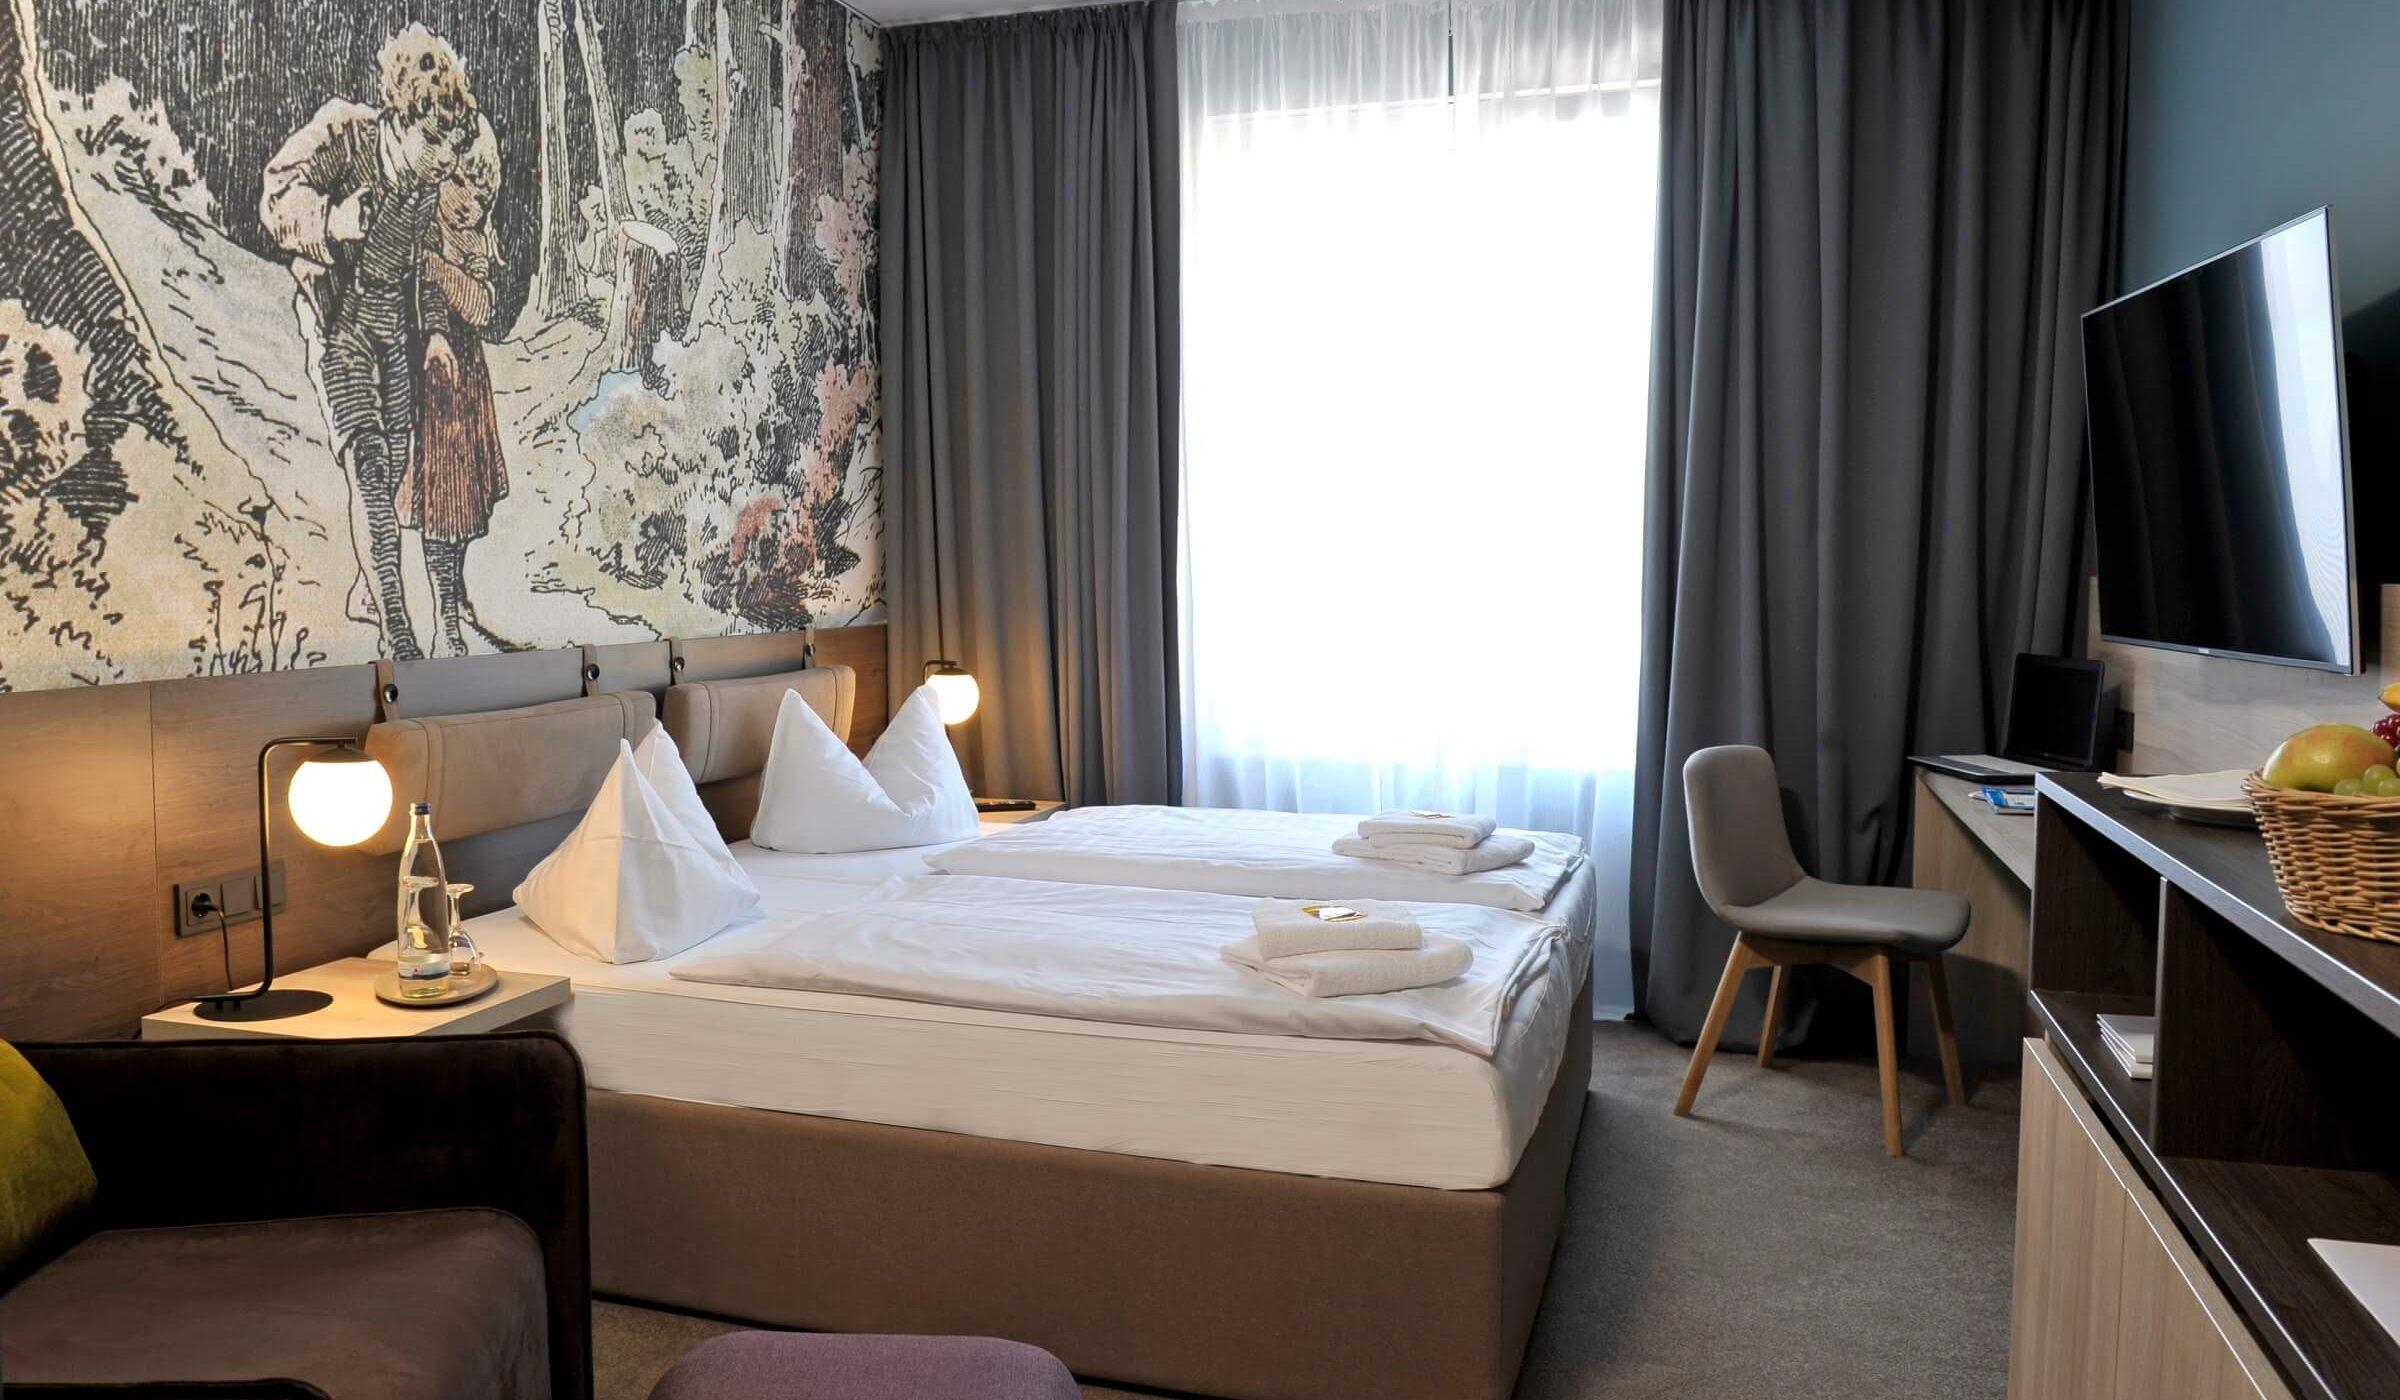 Doppelzimmer Hotel Viktorosa in Hofgeismar